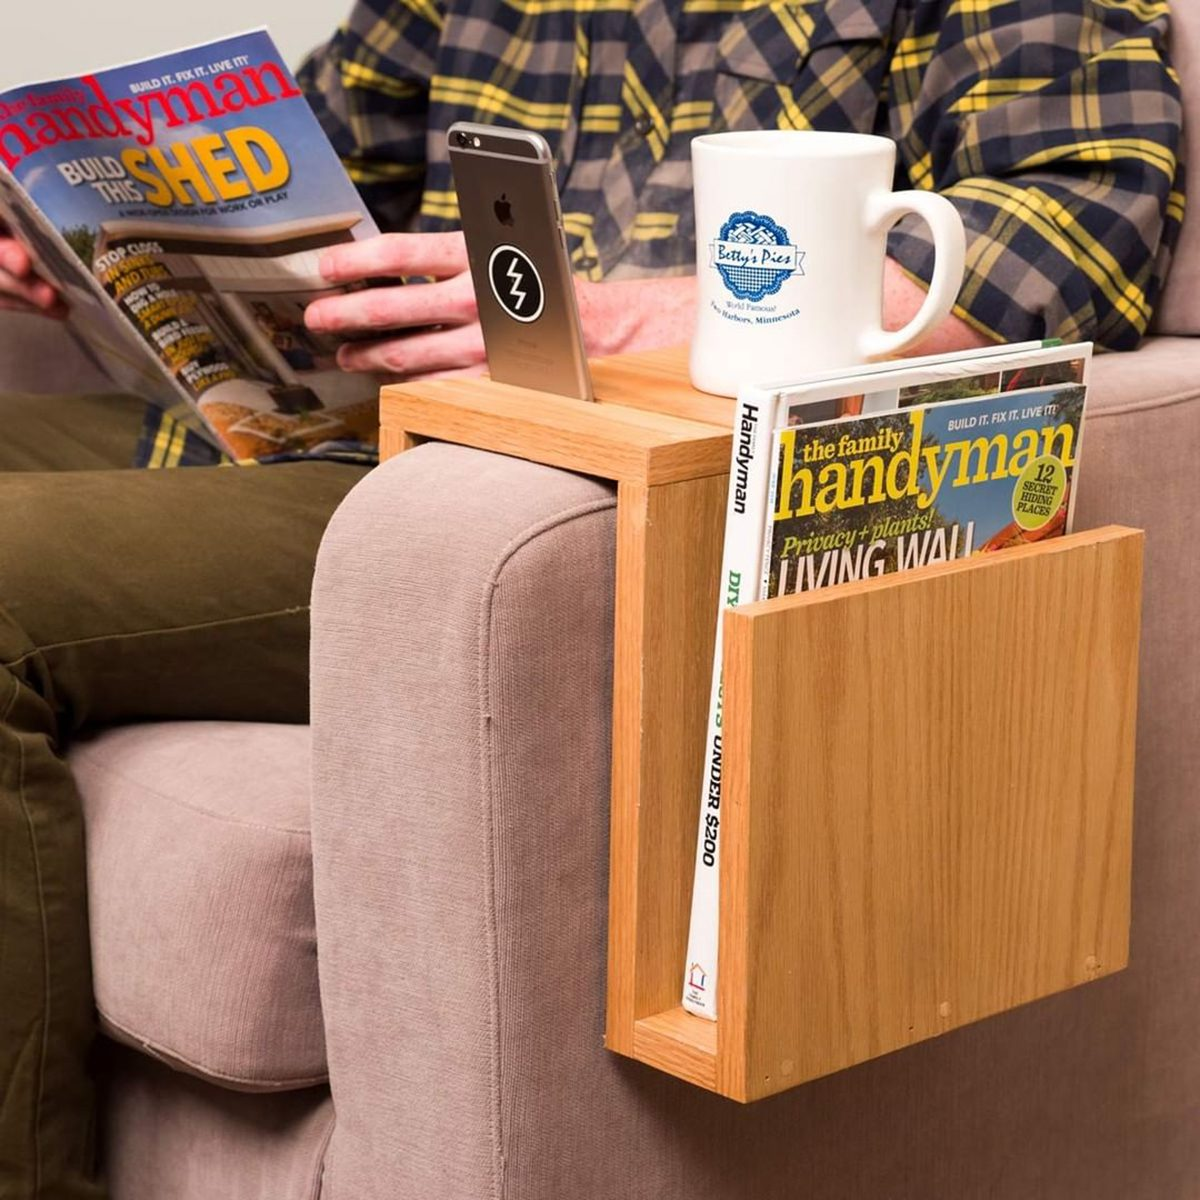 Subscription to Family Handyman